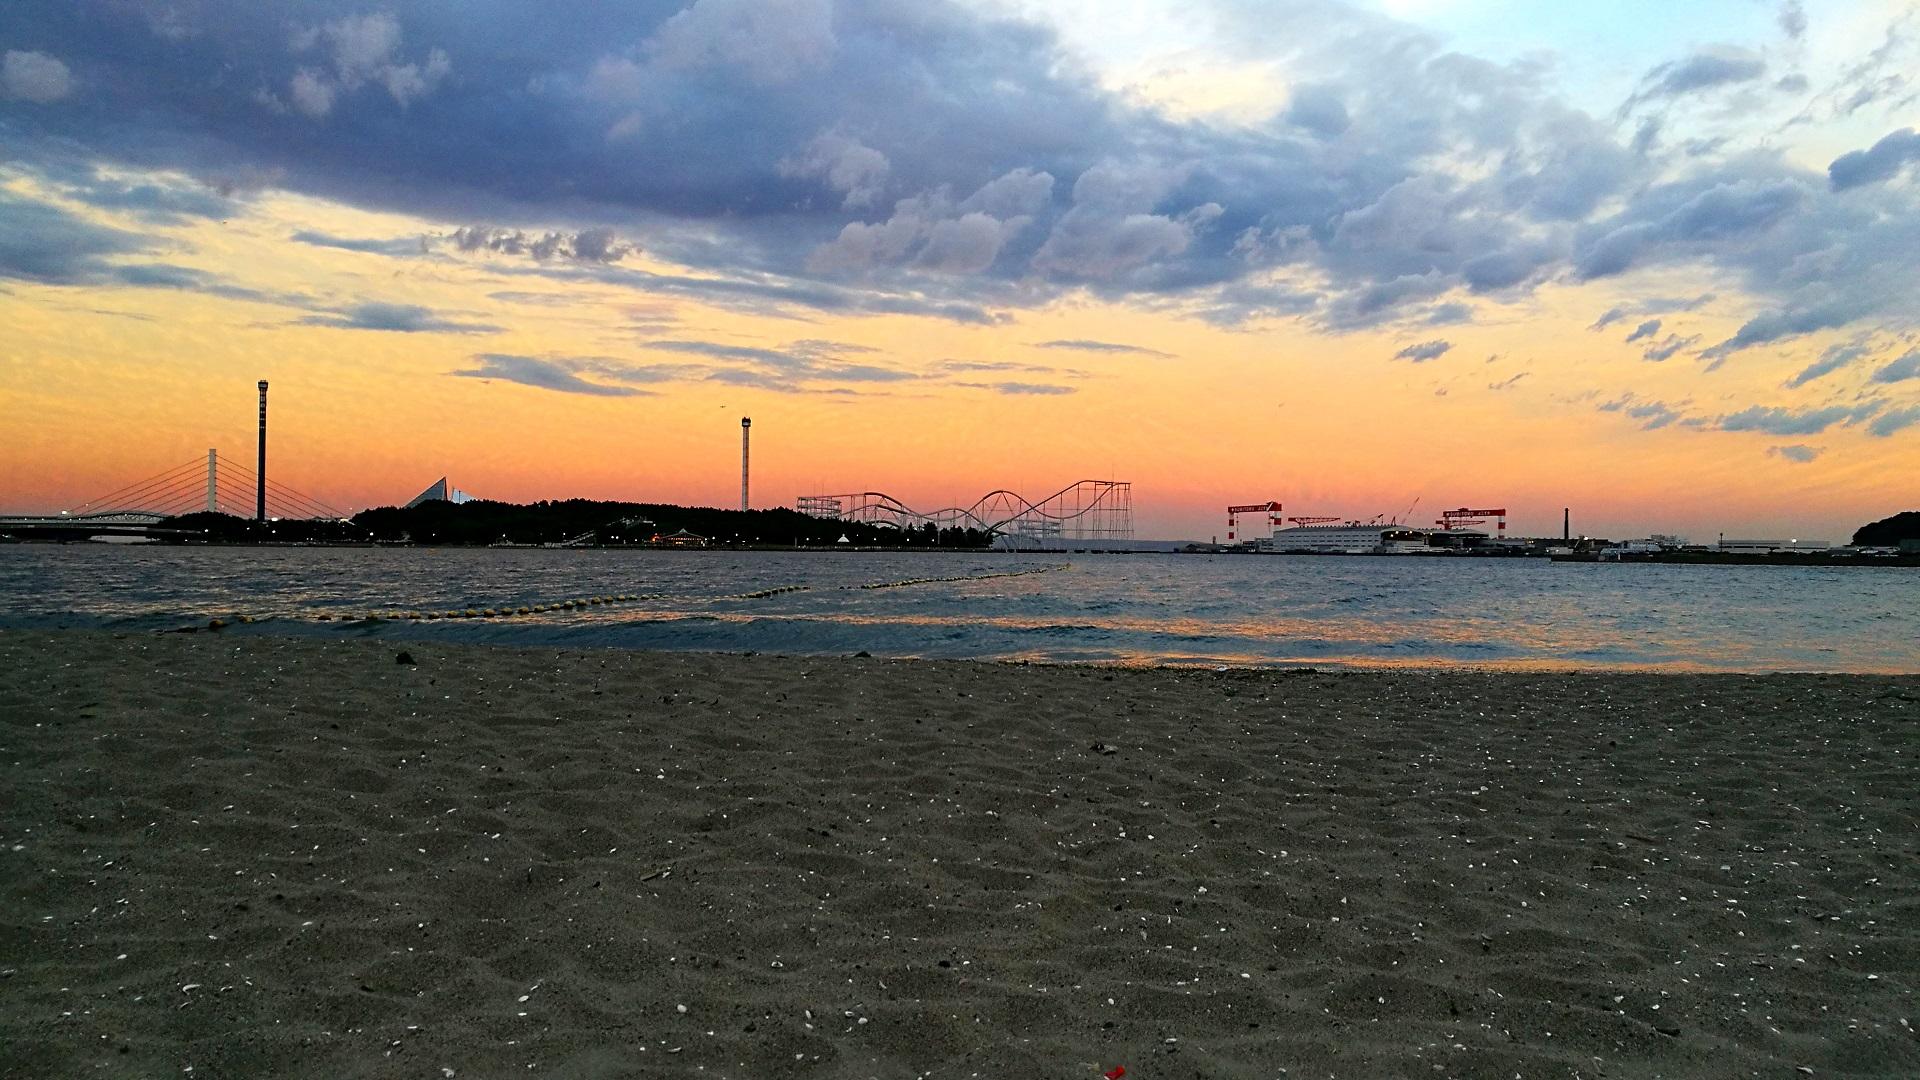 Sonnenuntergang Yokohama (Foto: Marina Hochholzner)